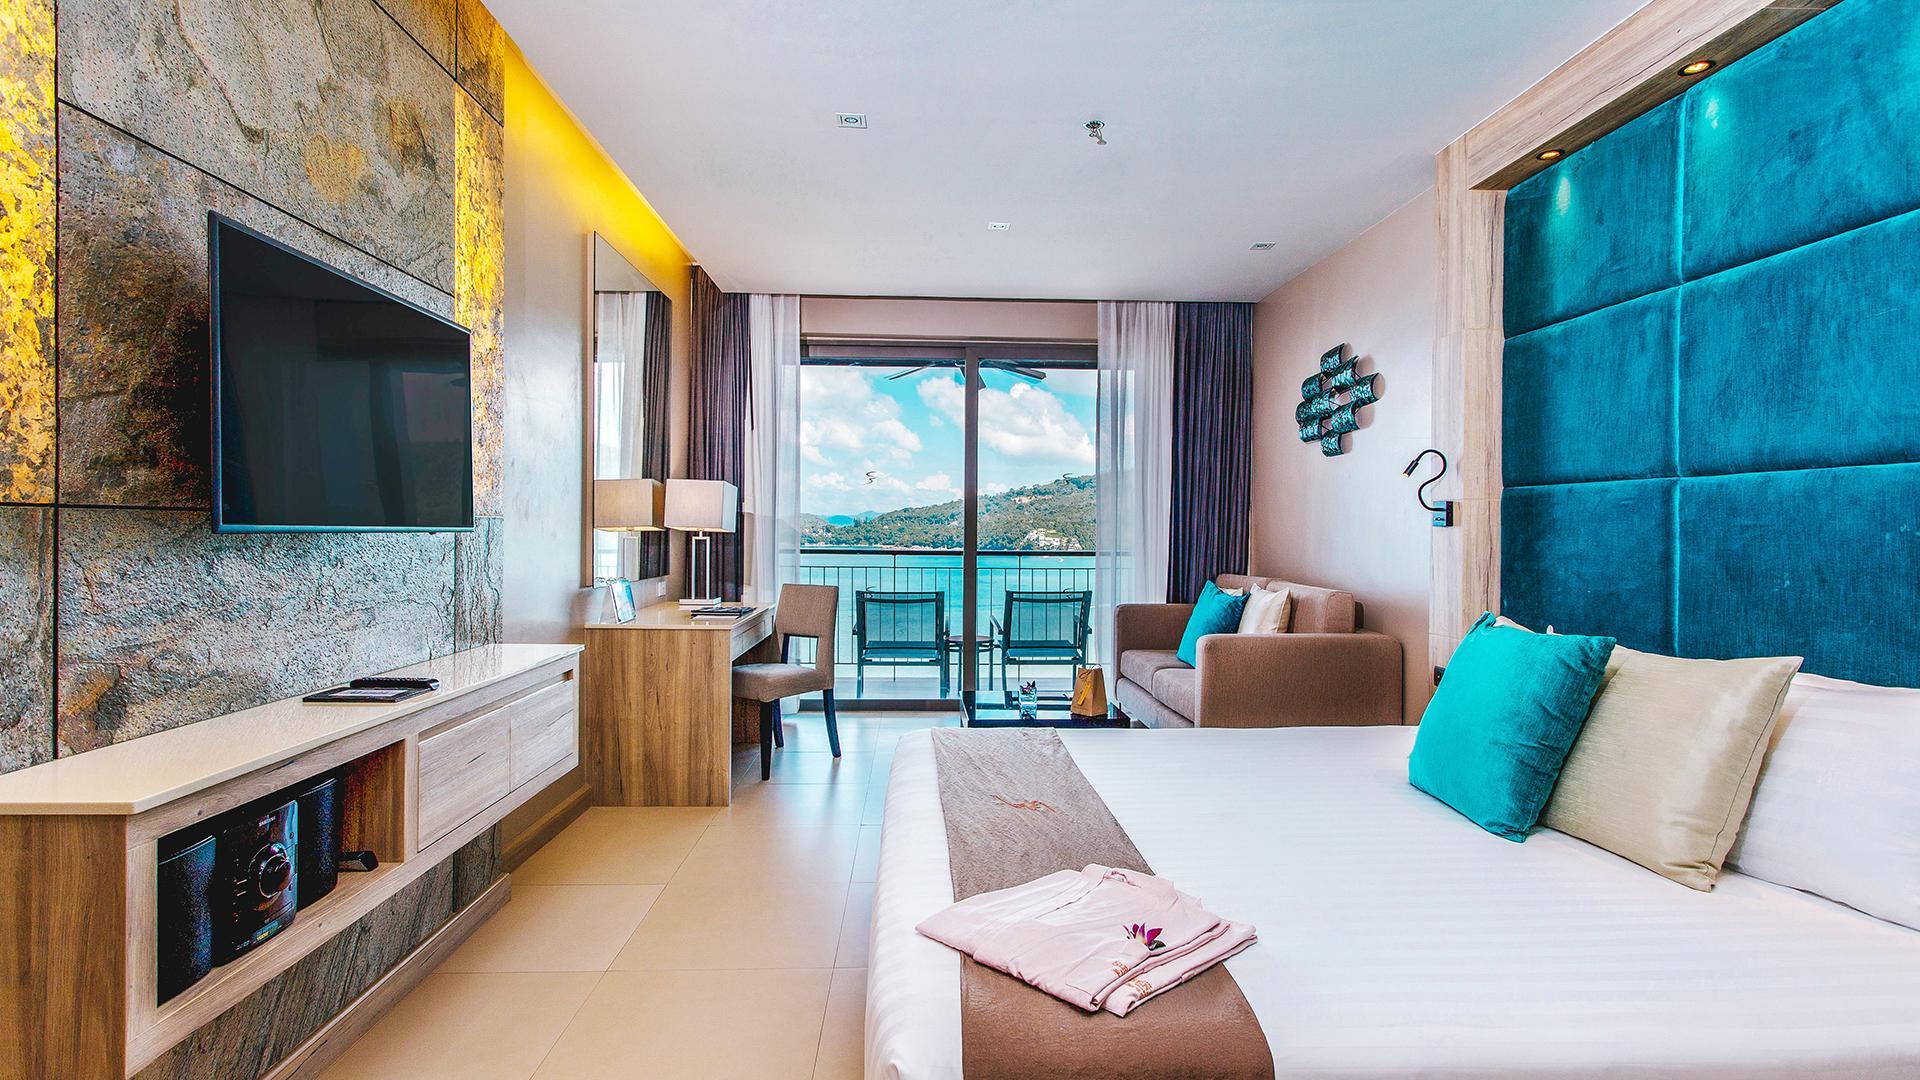 Sea View Studio Room image 1 at Cape Sienna Phuket Gourmet Hotel & Villas by Amphoe Kathu, Chang Wat Phuket, Thailand